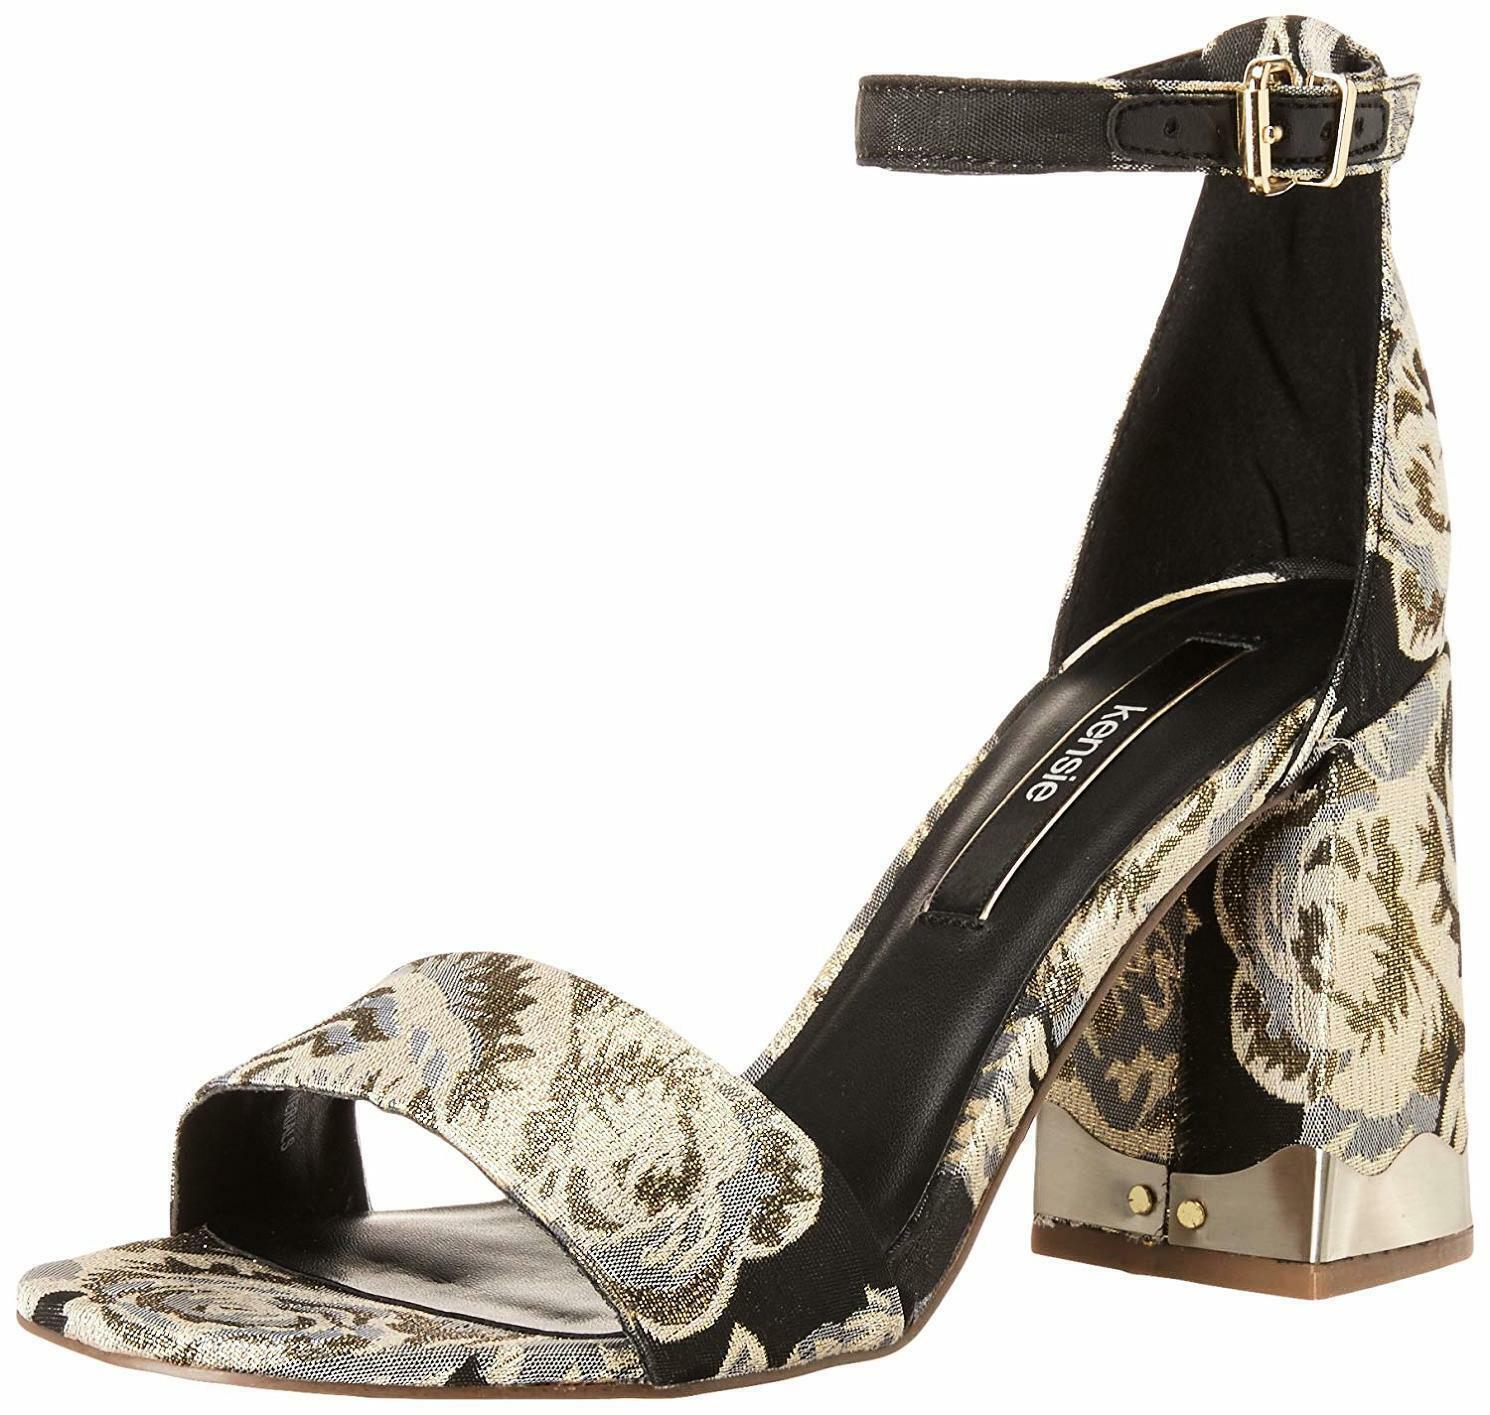 Kensie -Women's Sahar Heeled Sandals  , Size   8 M  , color  Black & gold